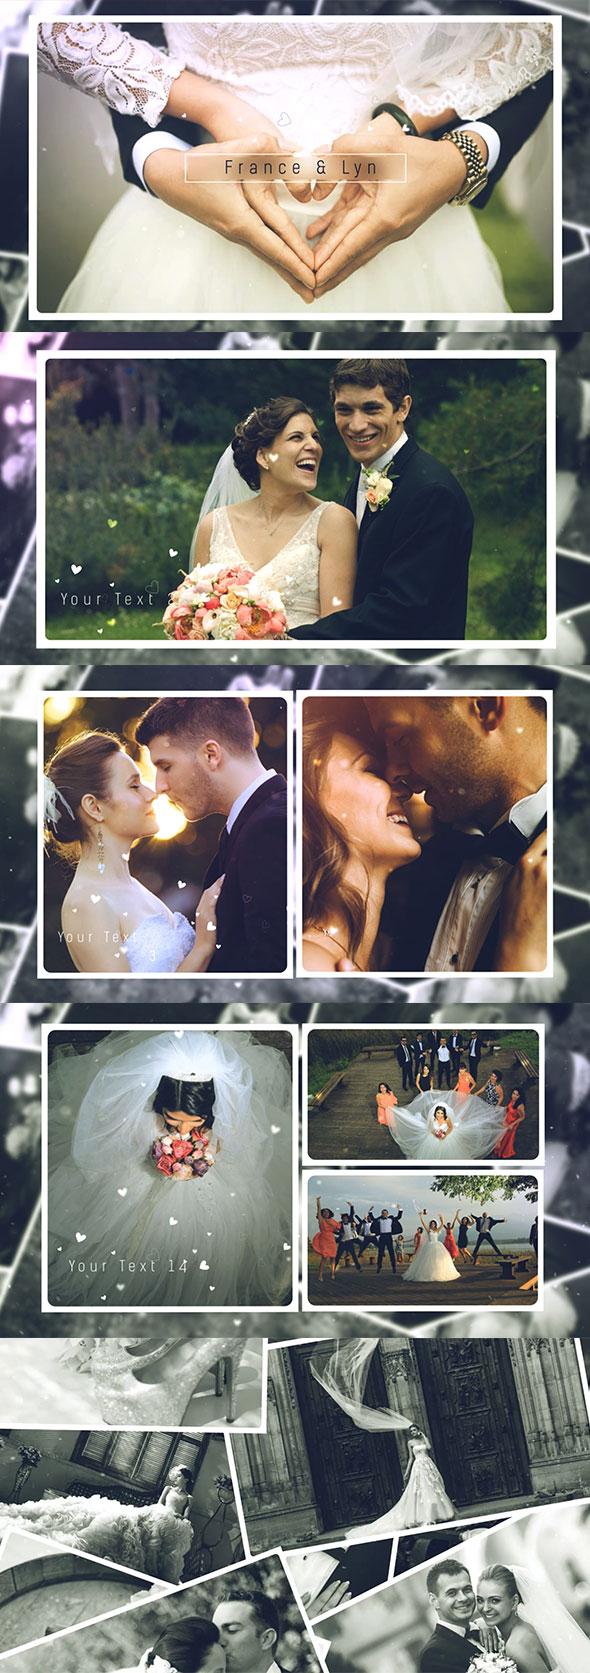 Wedding Gallery - 1